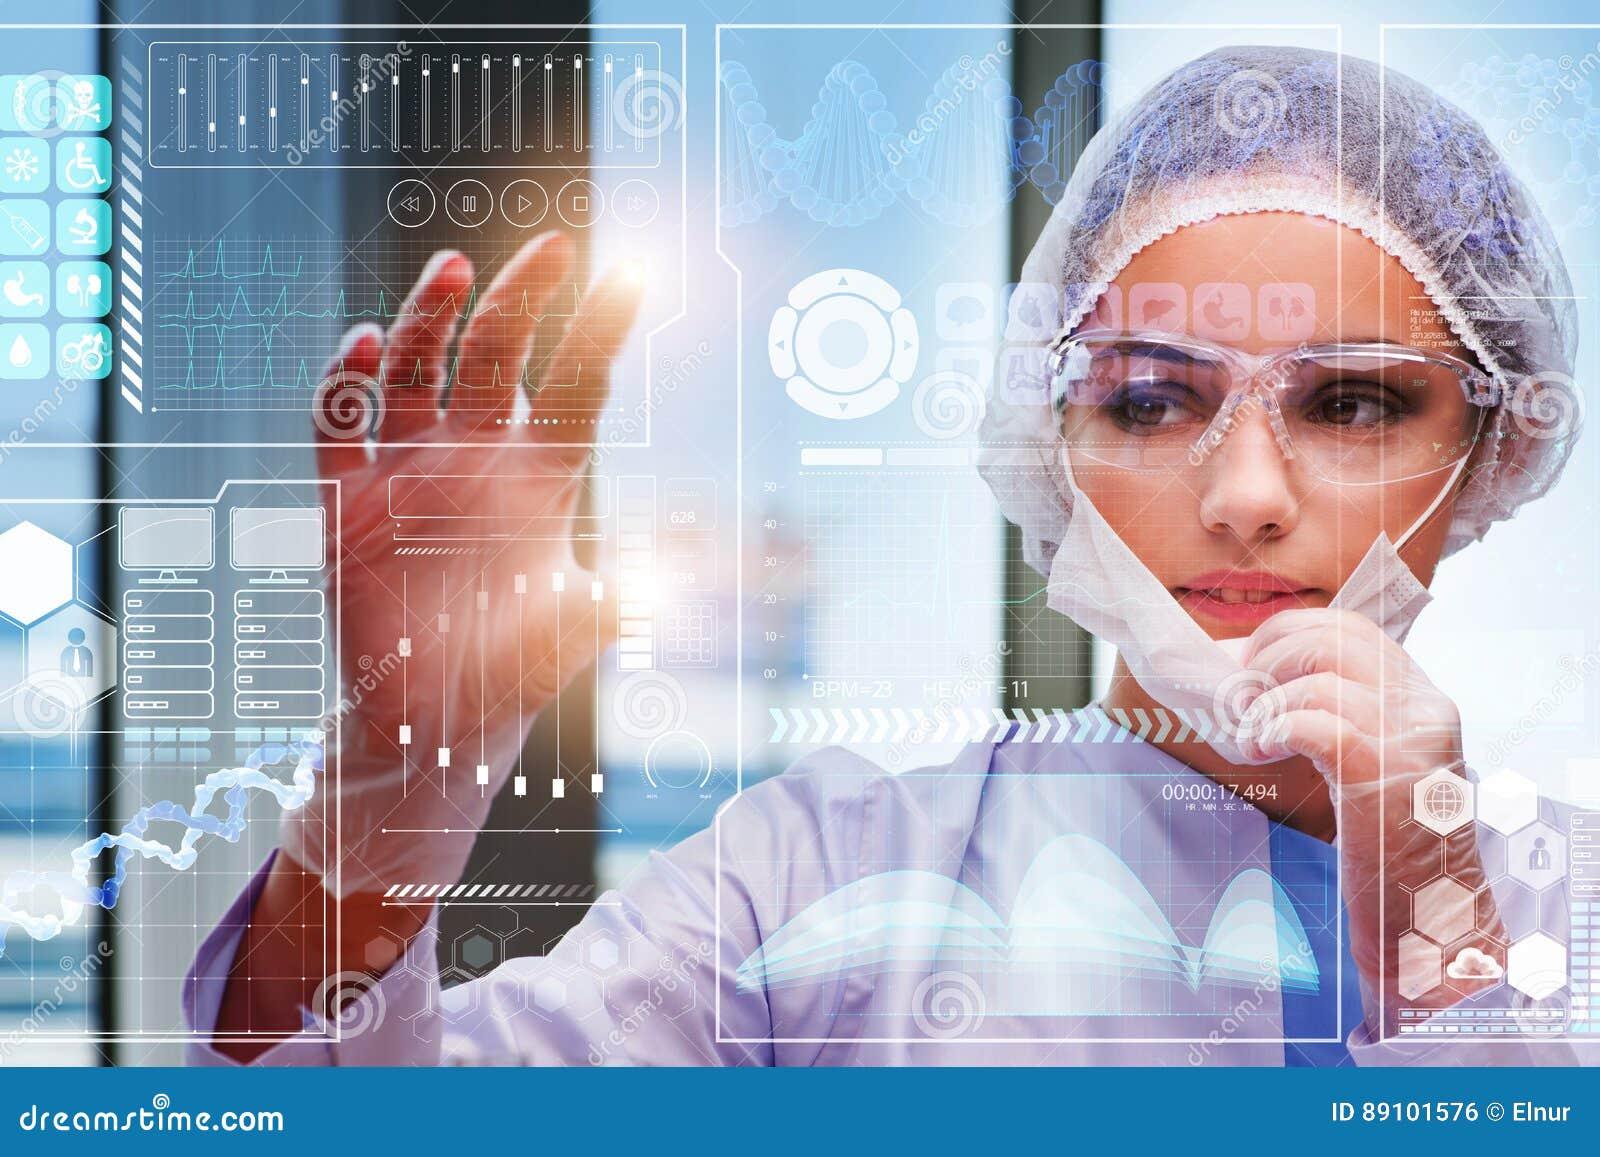 The doctor in futuristic medical concept pressing button